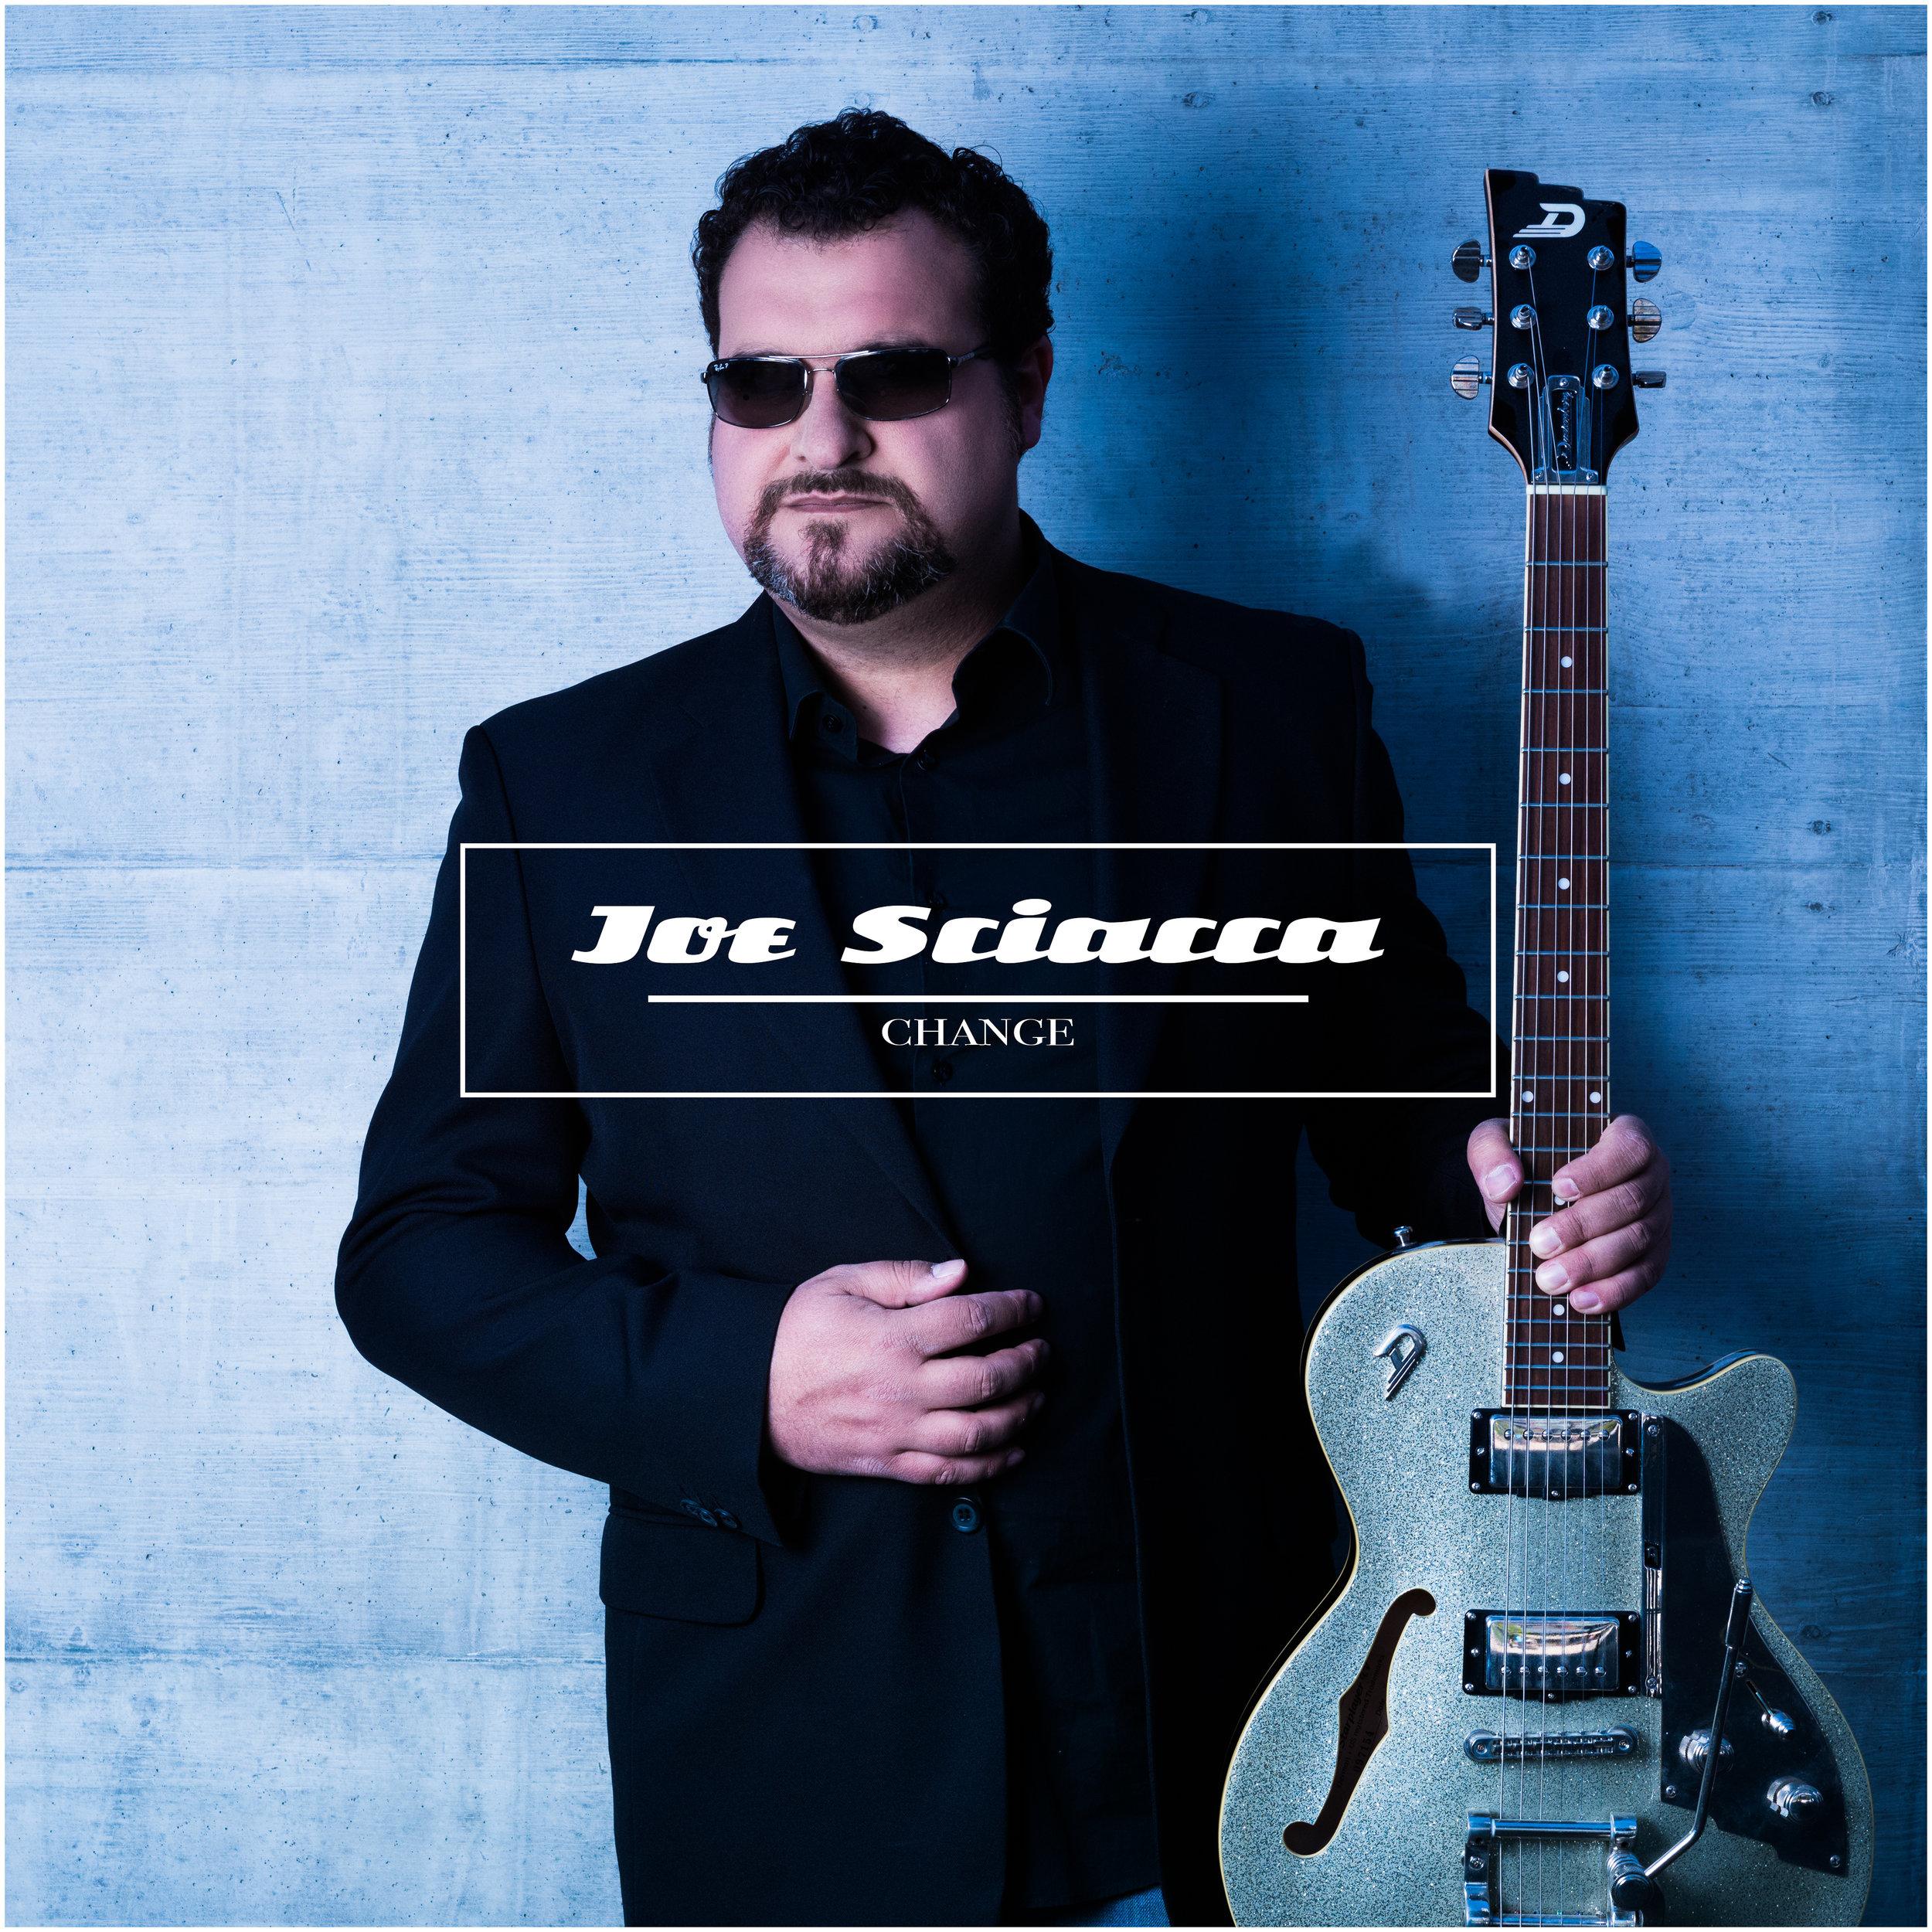 Joe Sciacca - Change (Single) - Photography by Thomas Biasotto